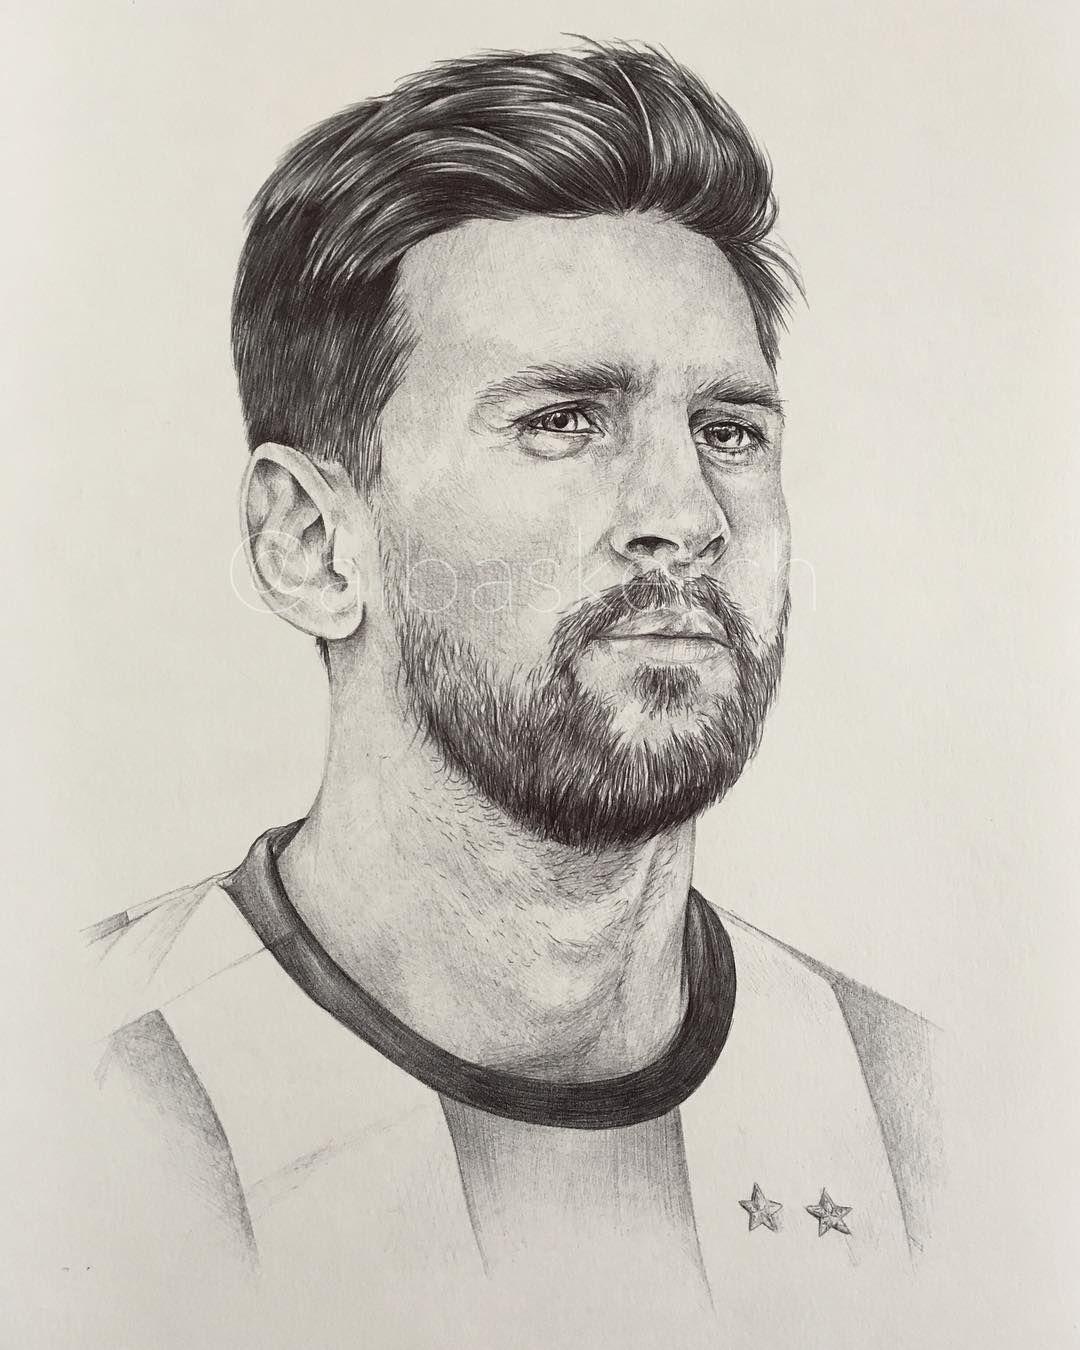 Lionel Messi Argentina Fwc18 By Albasketch Draw Drawing Illustration Art Artist Sketch Sketchbook Ink Messi Leo L Messi Drawing Lionel Messi Messi